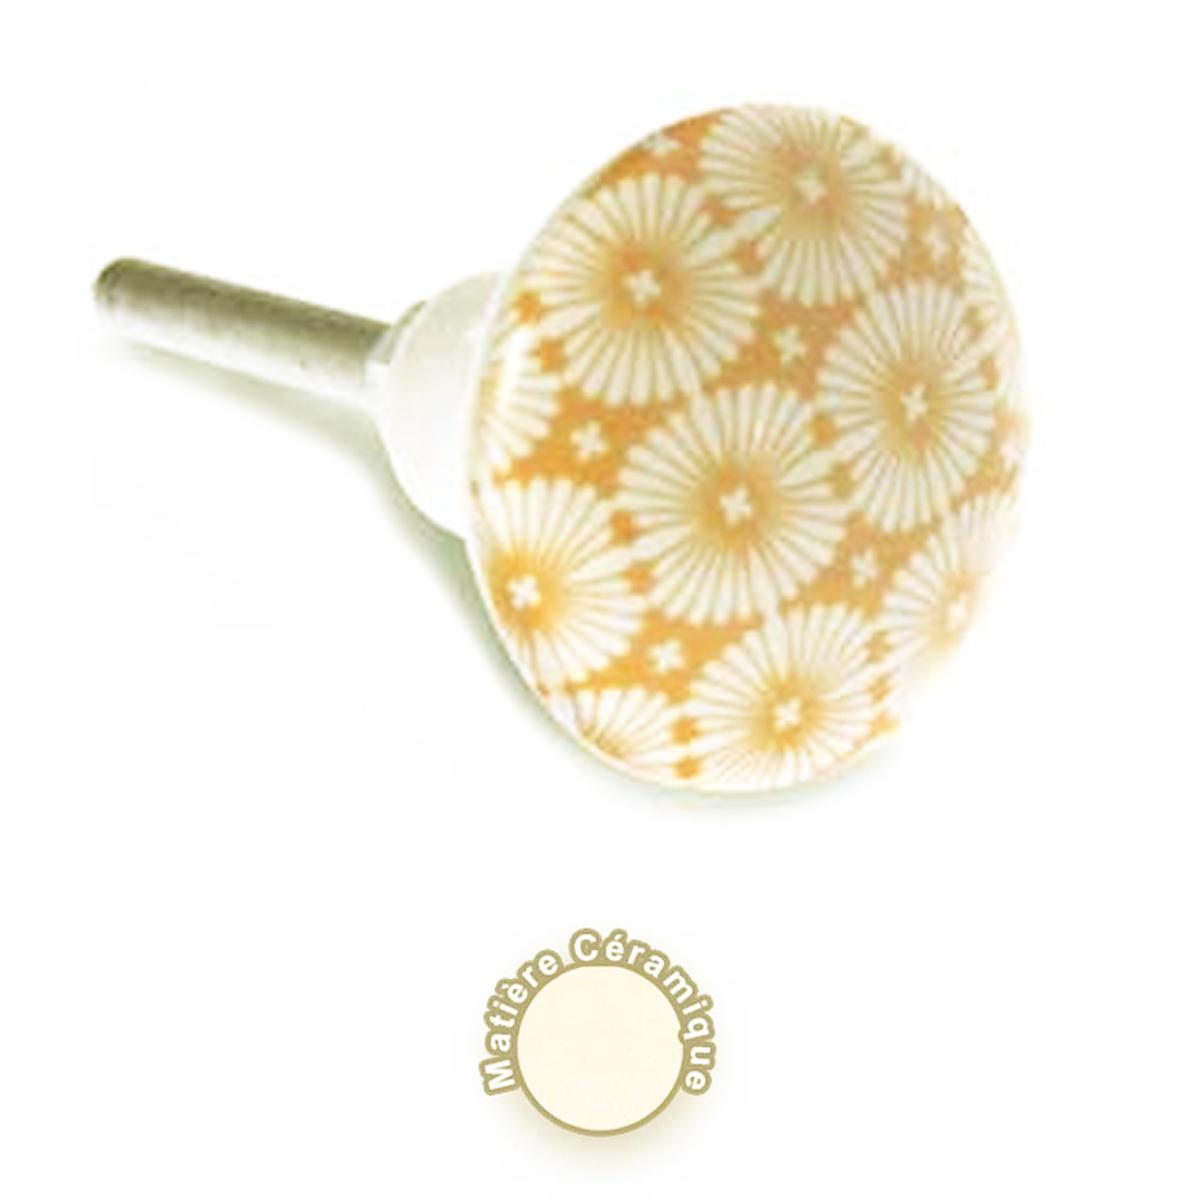 Bouton meuble céramique \'Boho\' beige blanc - 8x4 cm - [A0404]